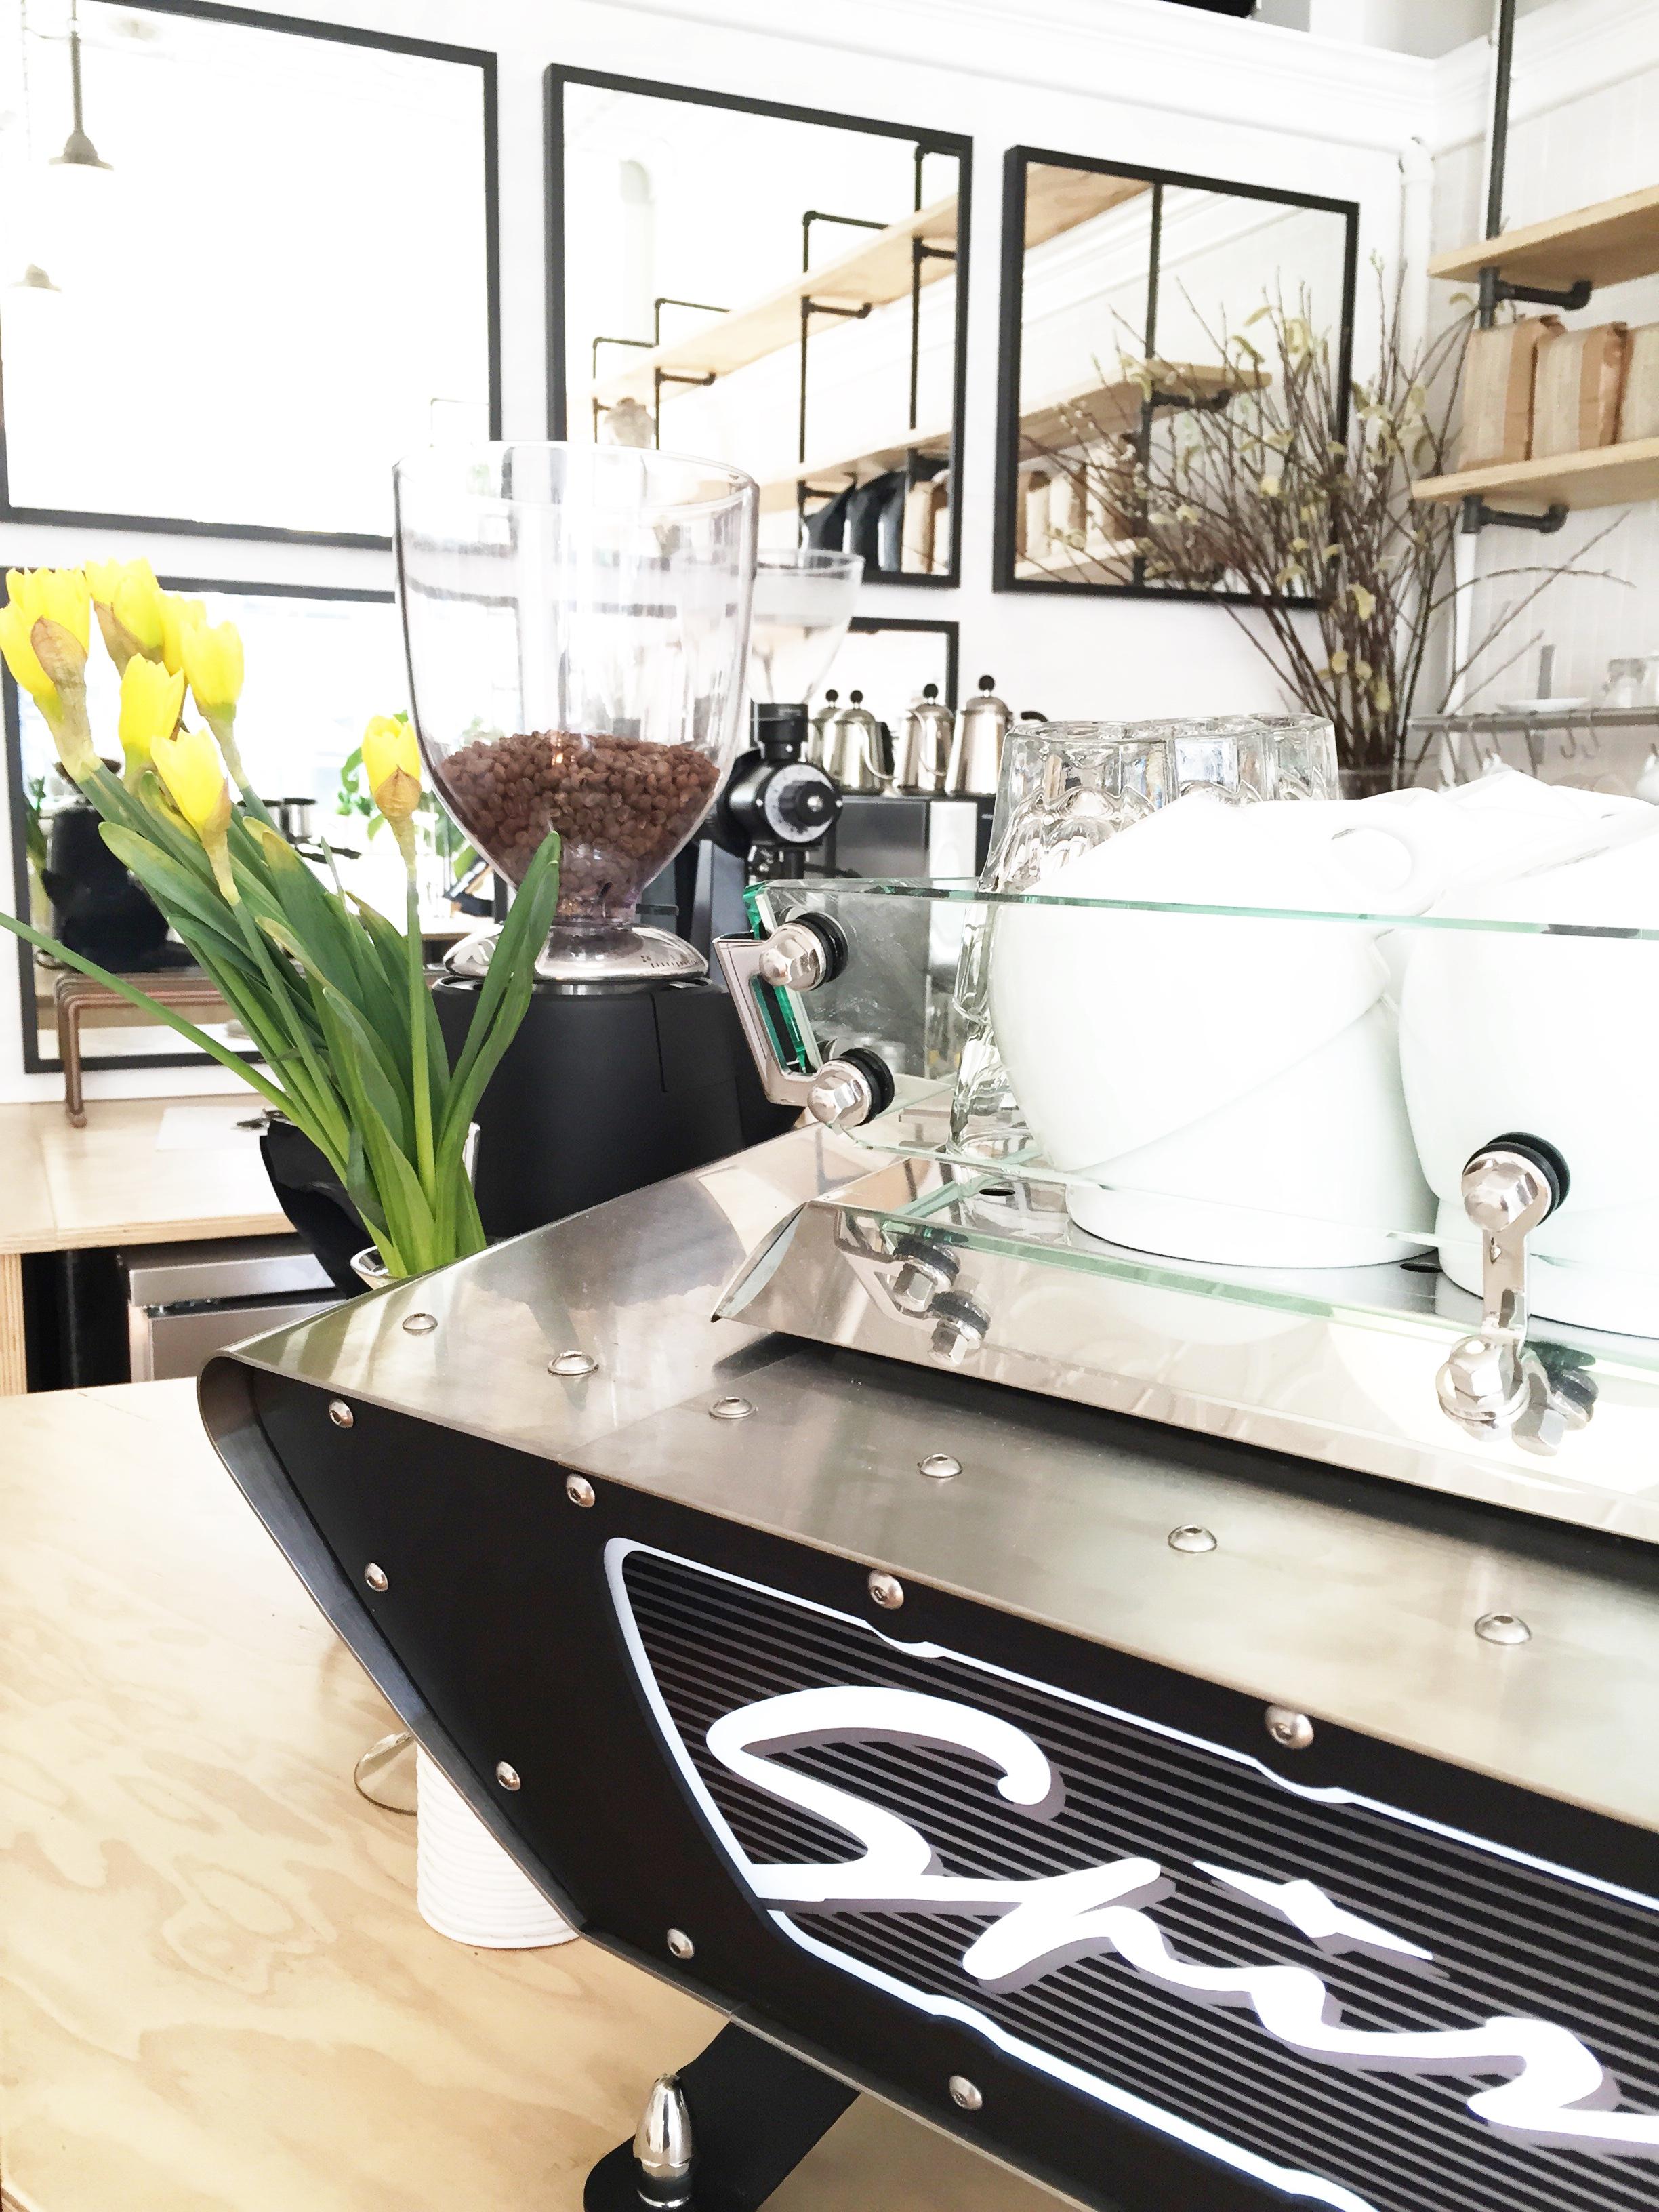 Spirit espresso machine and flowers at 4121 Main, Pittsburgh